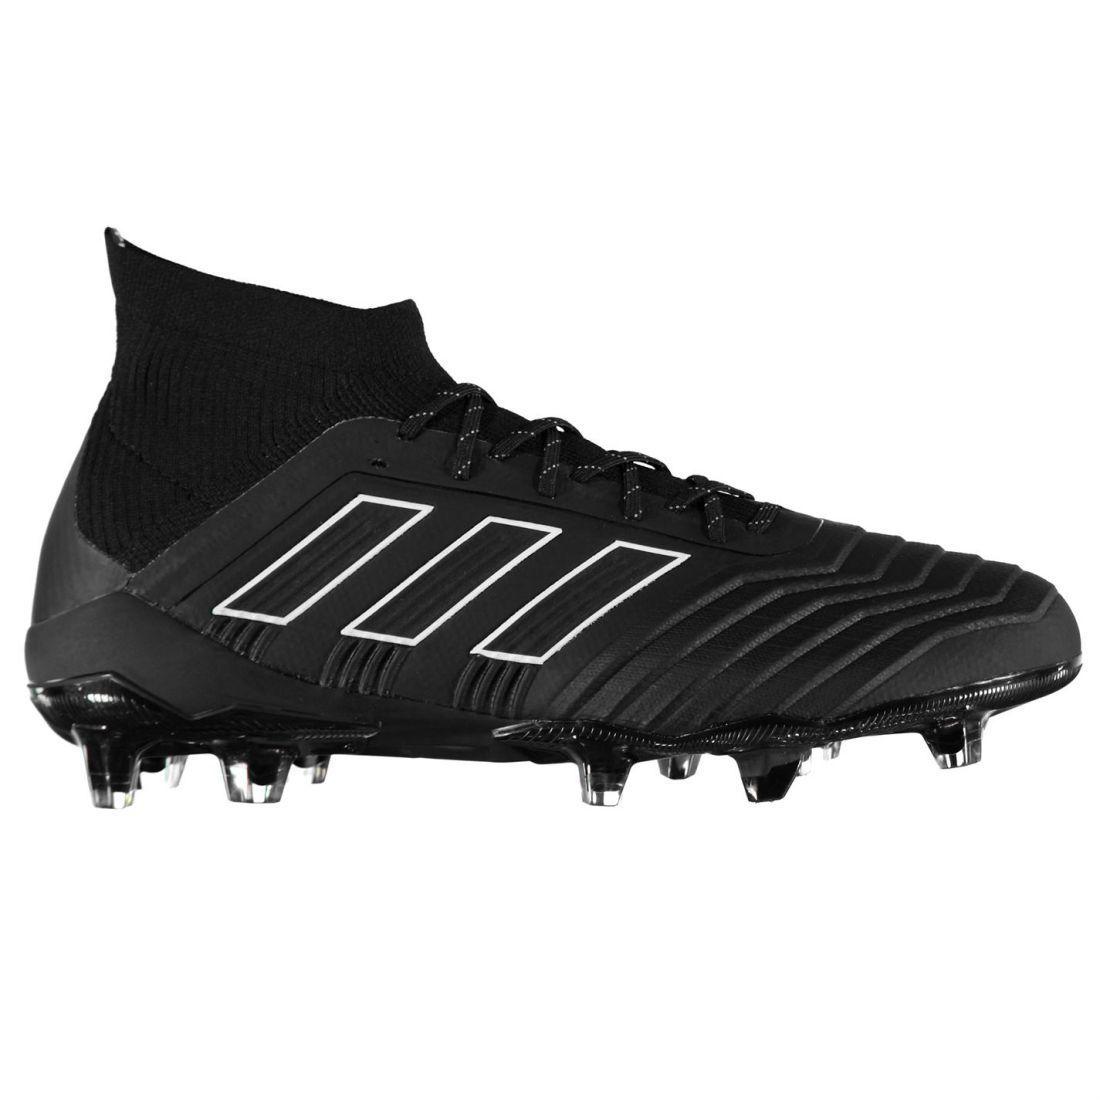 Adidas Para Hombre Projoator 18.1 FG botas De Fútbol Terreno Firme Con Cordones Imitación de punto